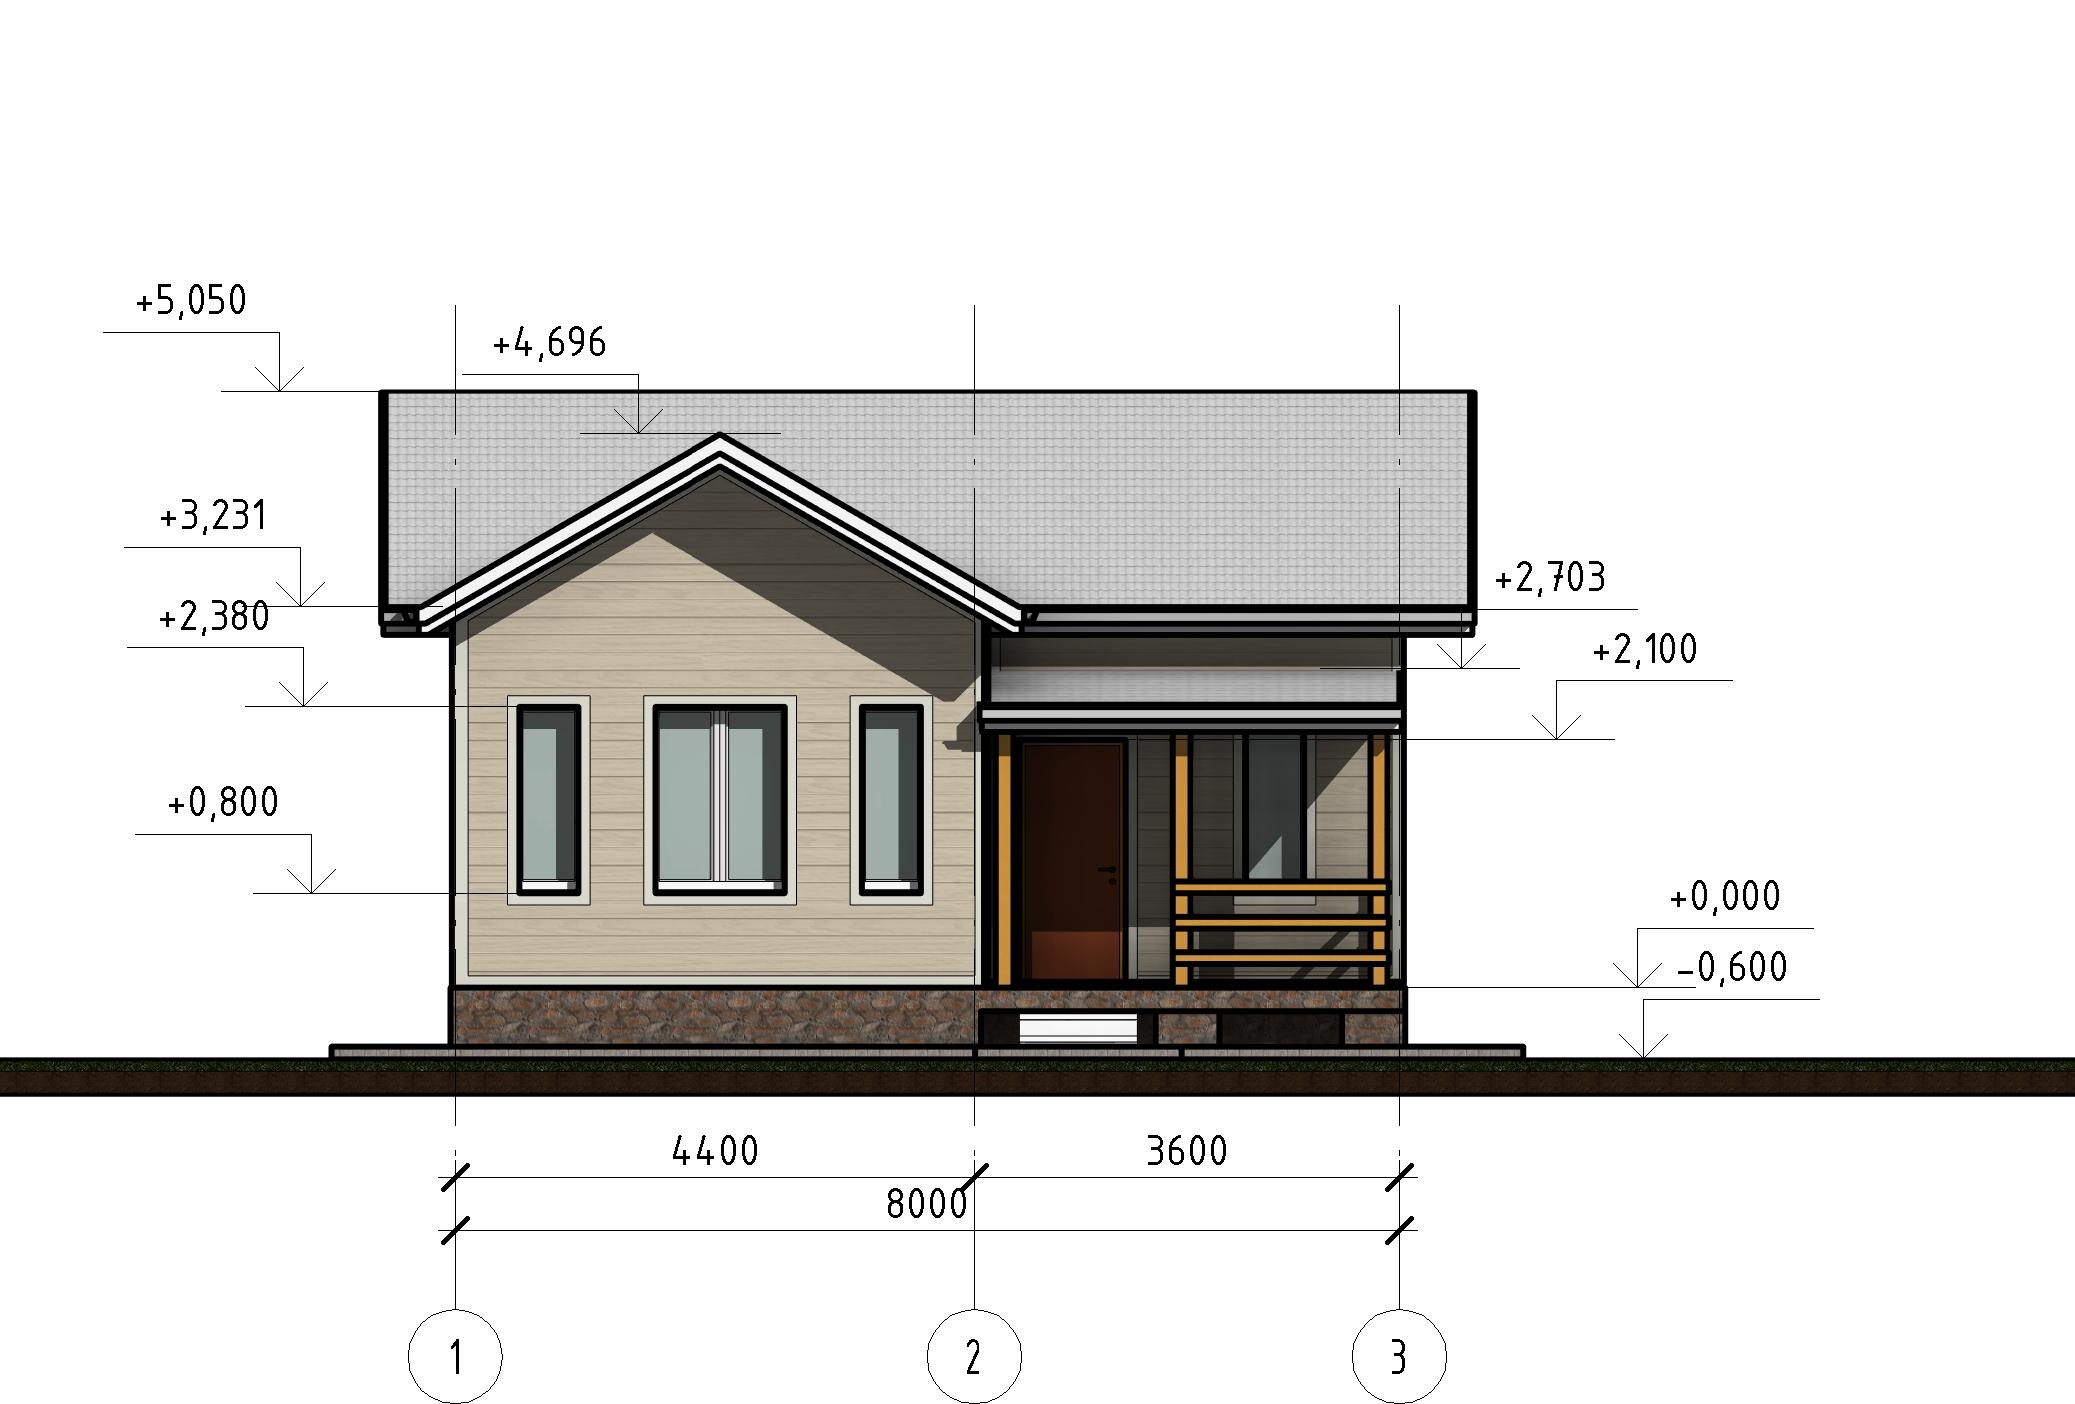 Проект КД-33 - Фасад 1-3